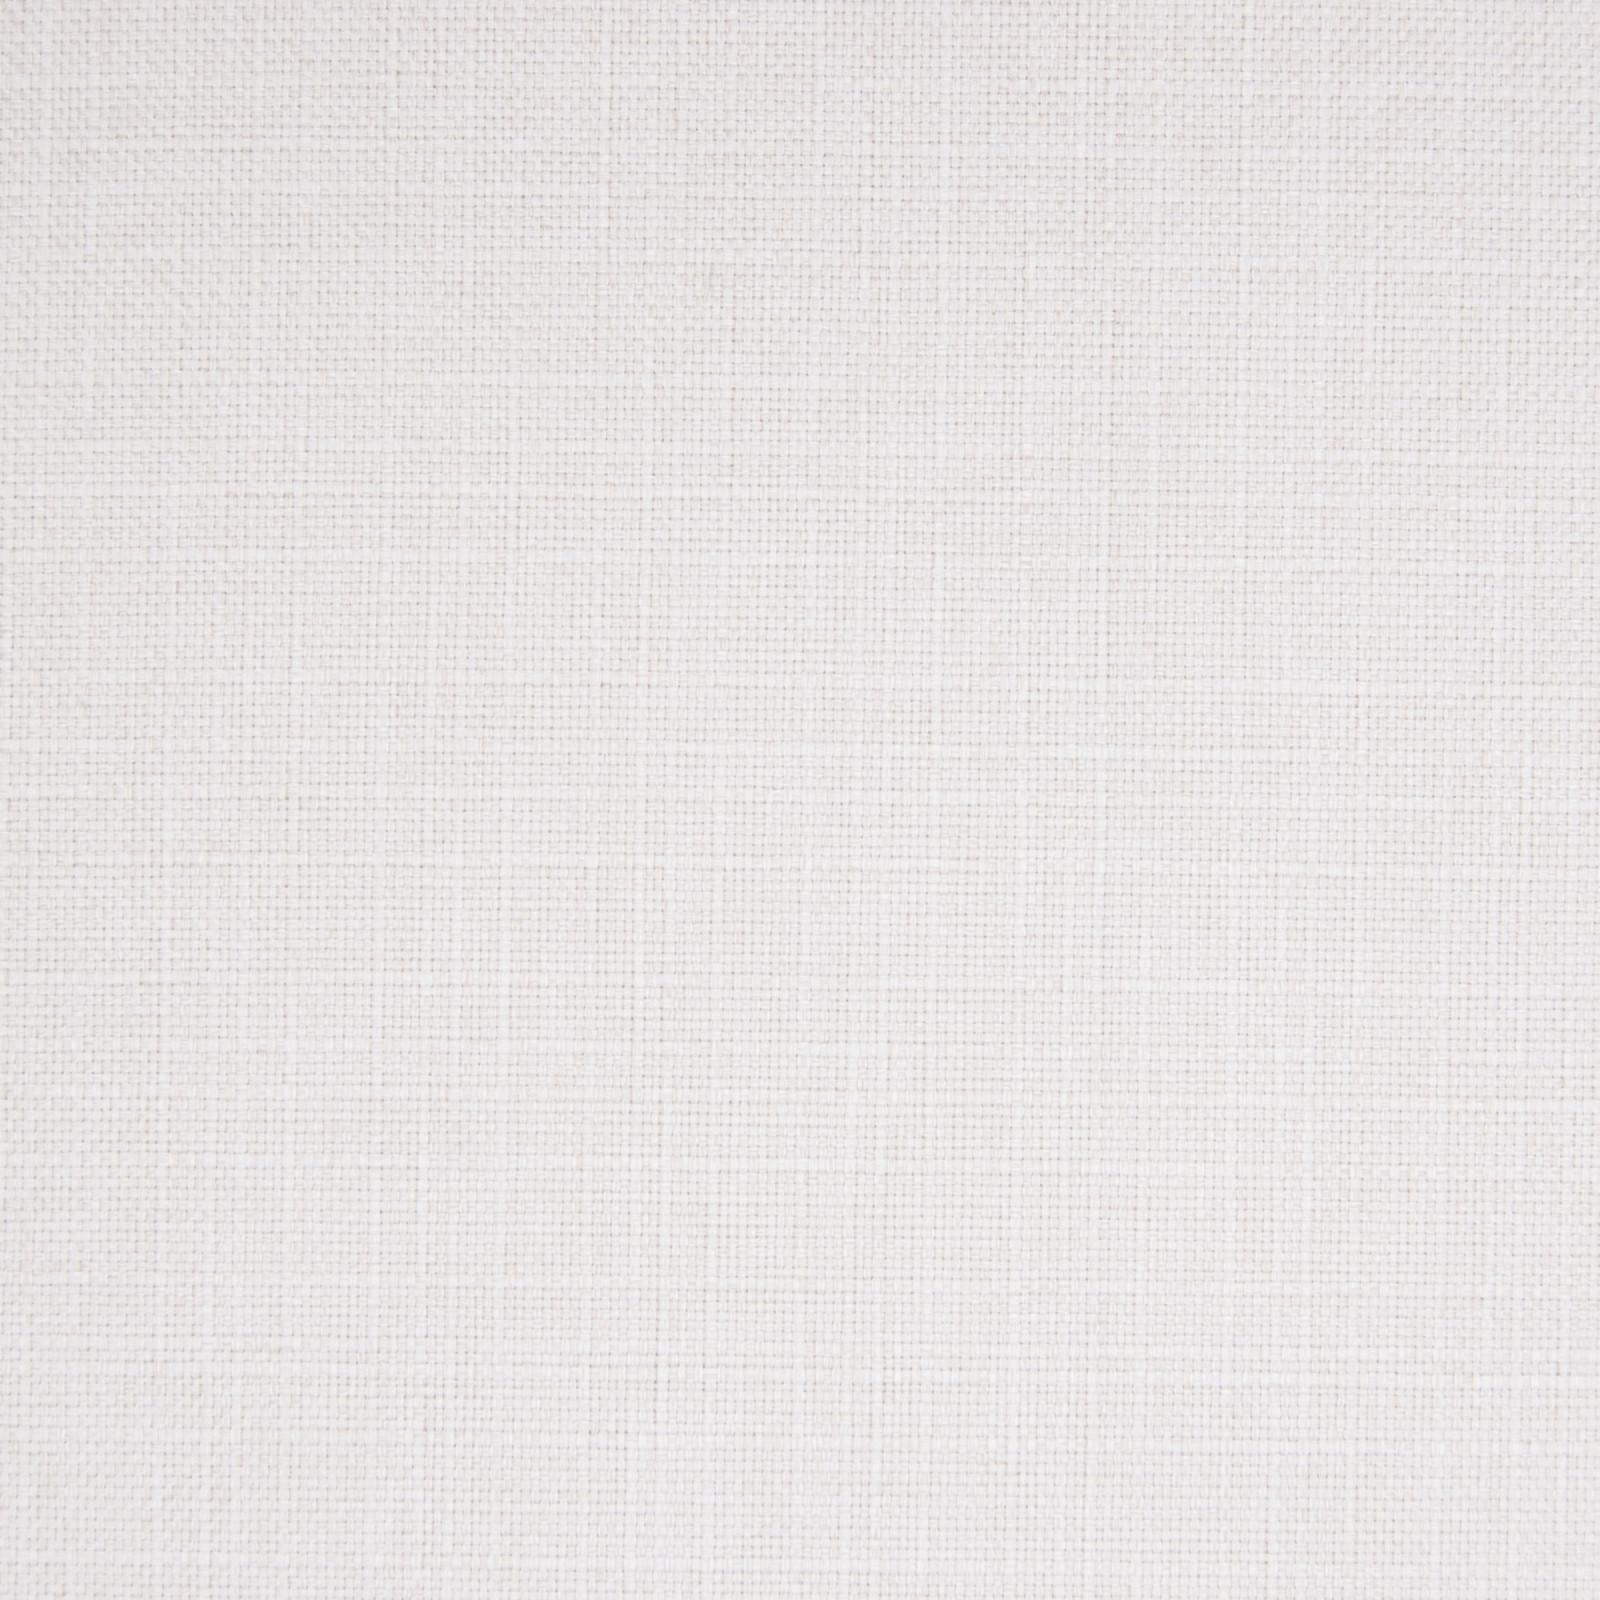 B6783 Pearl Greenhouse Fabrics